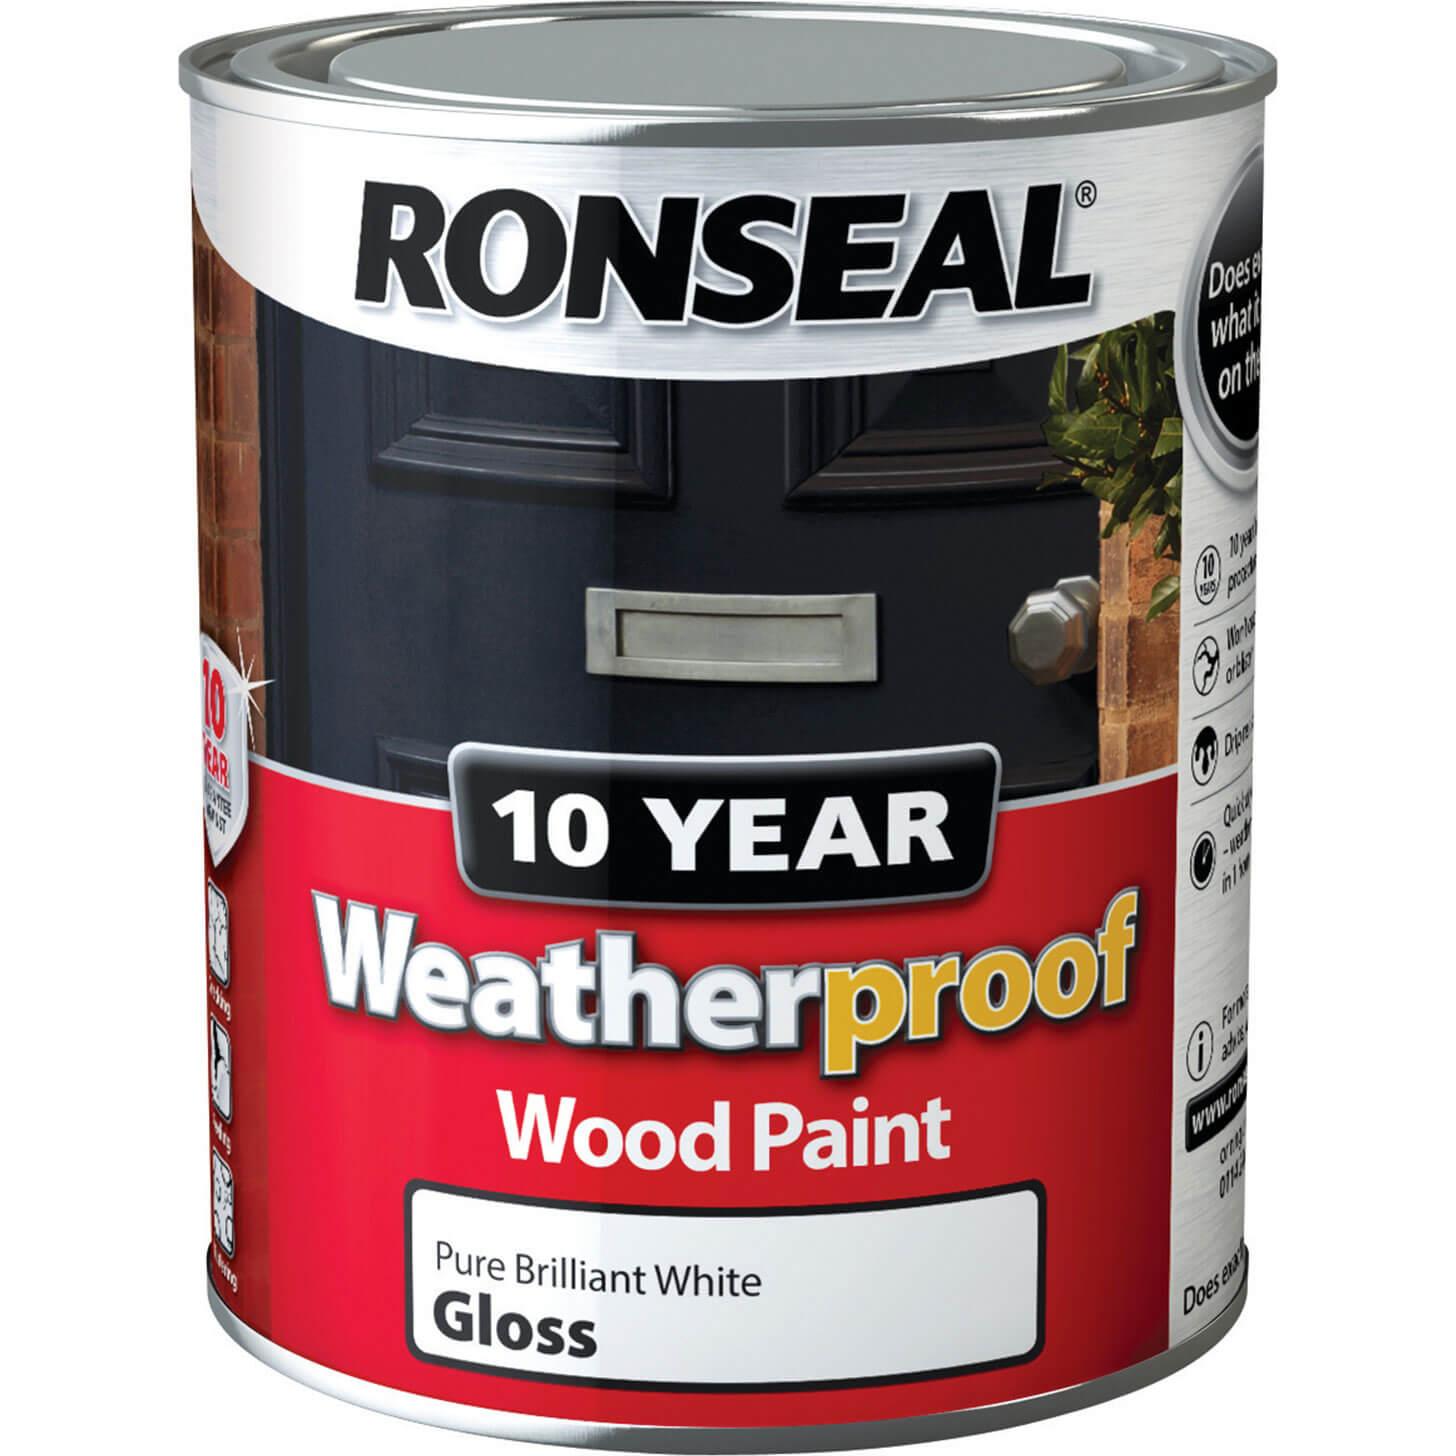 Ronseal Weatherproof 10 Year Exterior Gloss Wood Paint White 750ml